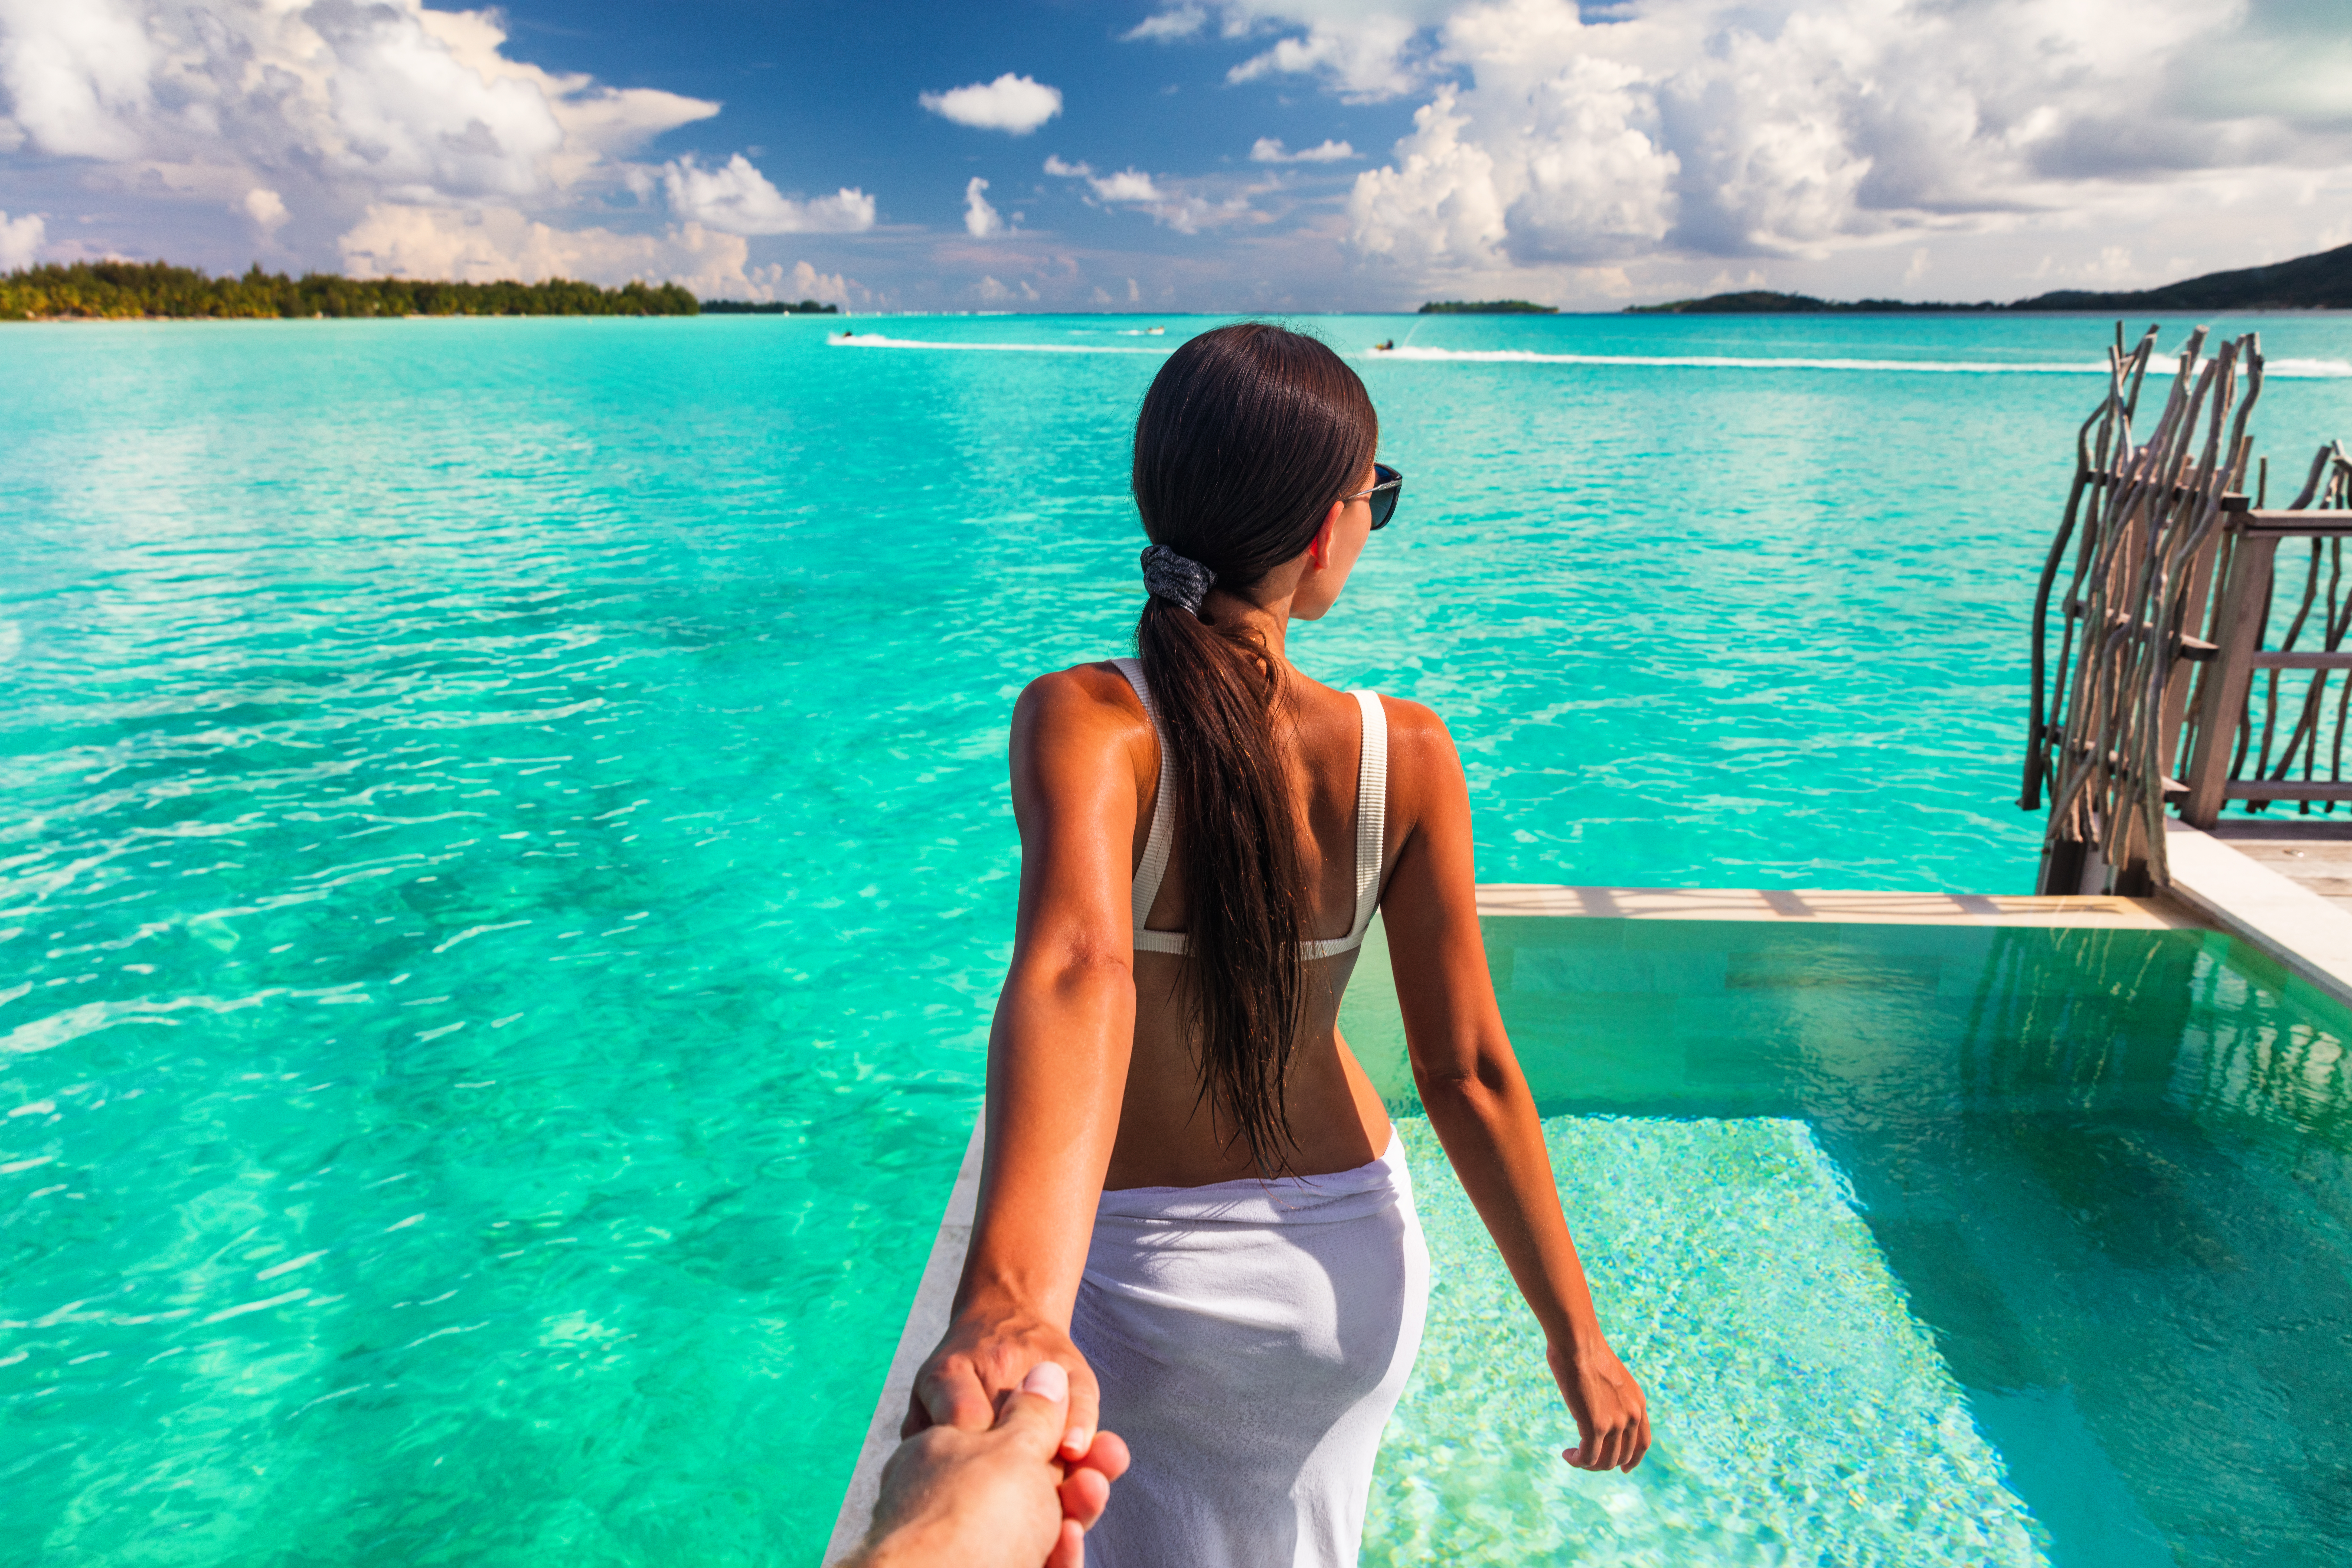 Follow me beach couple man holding girlf